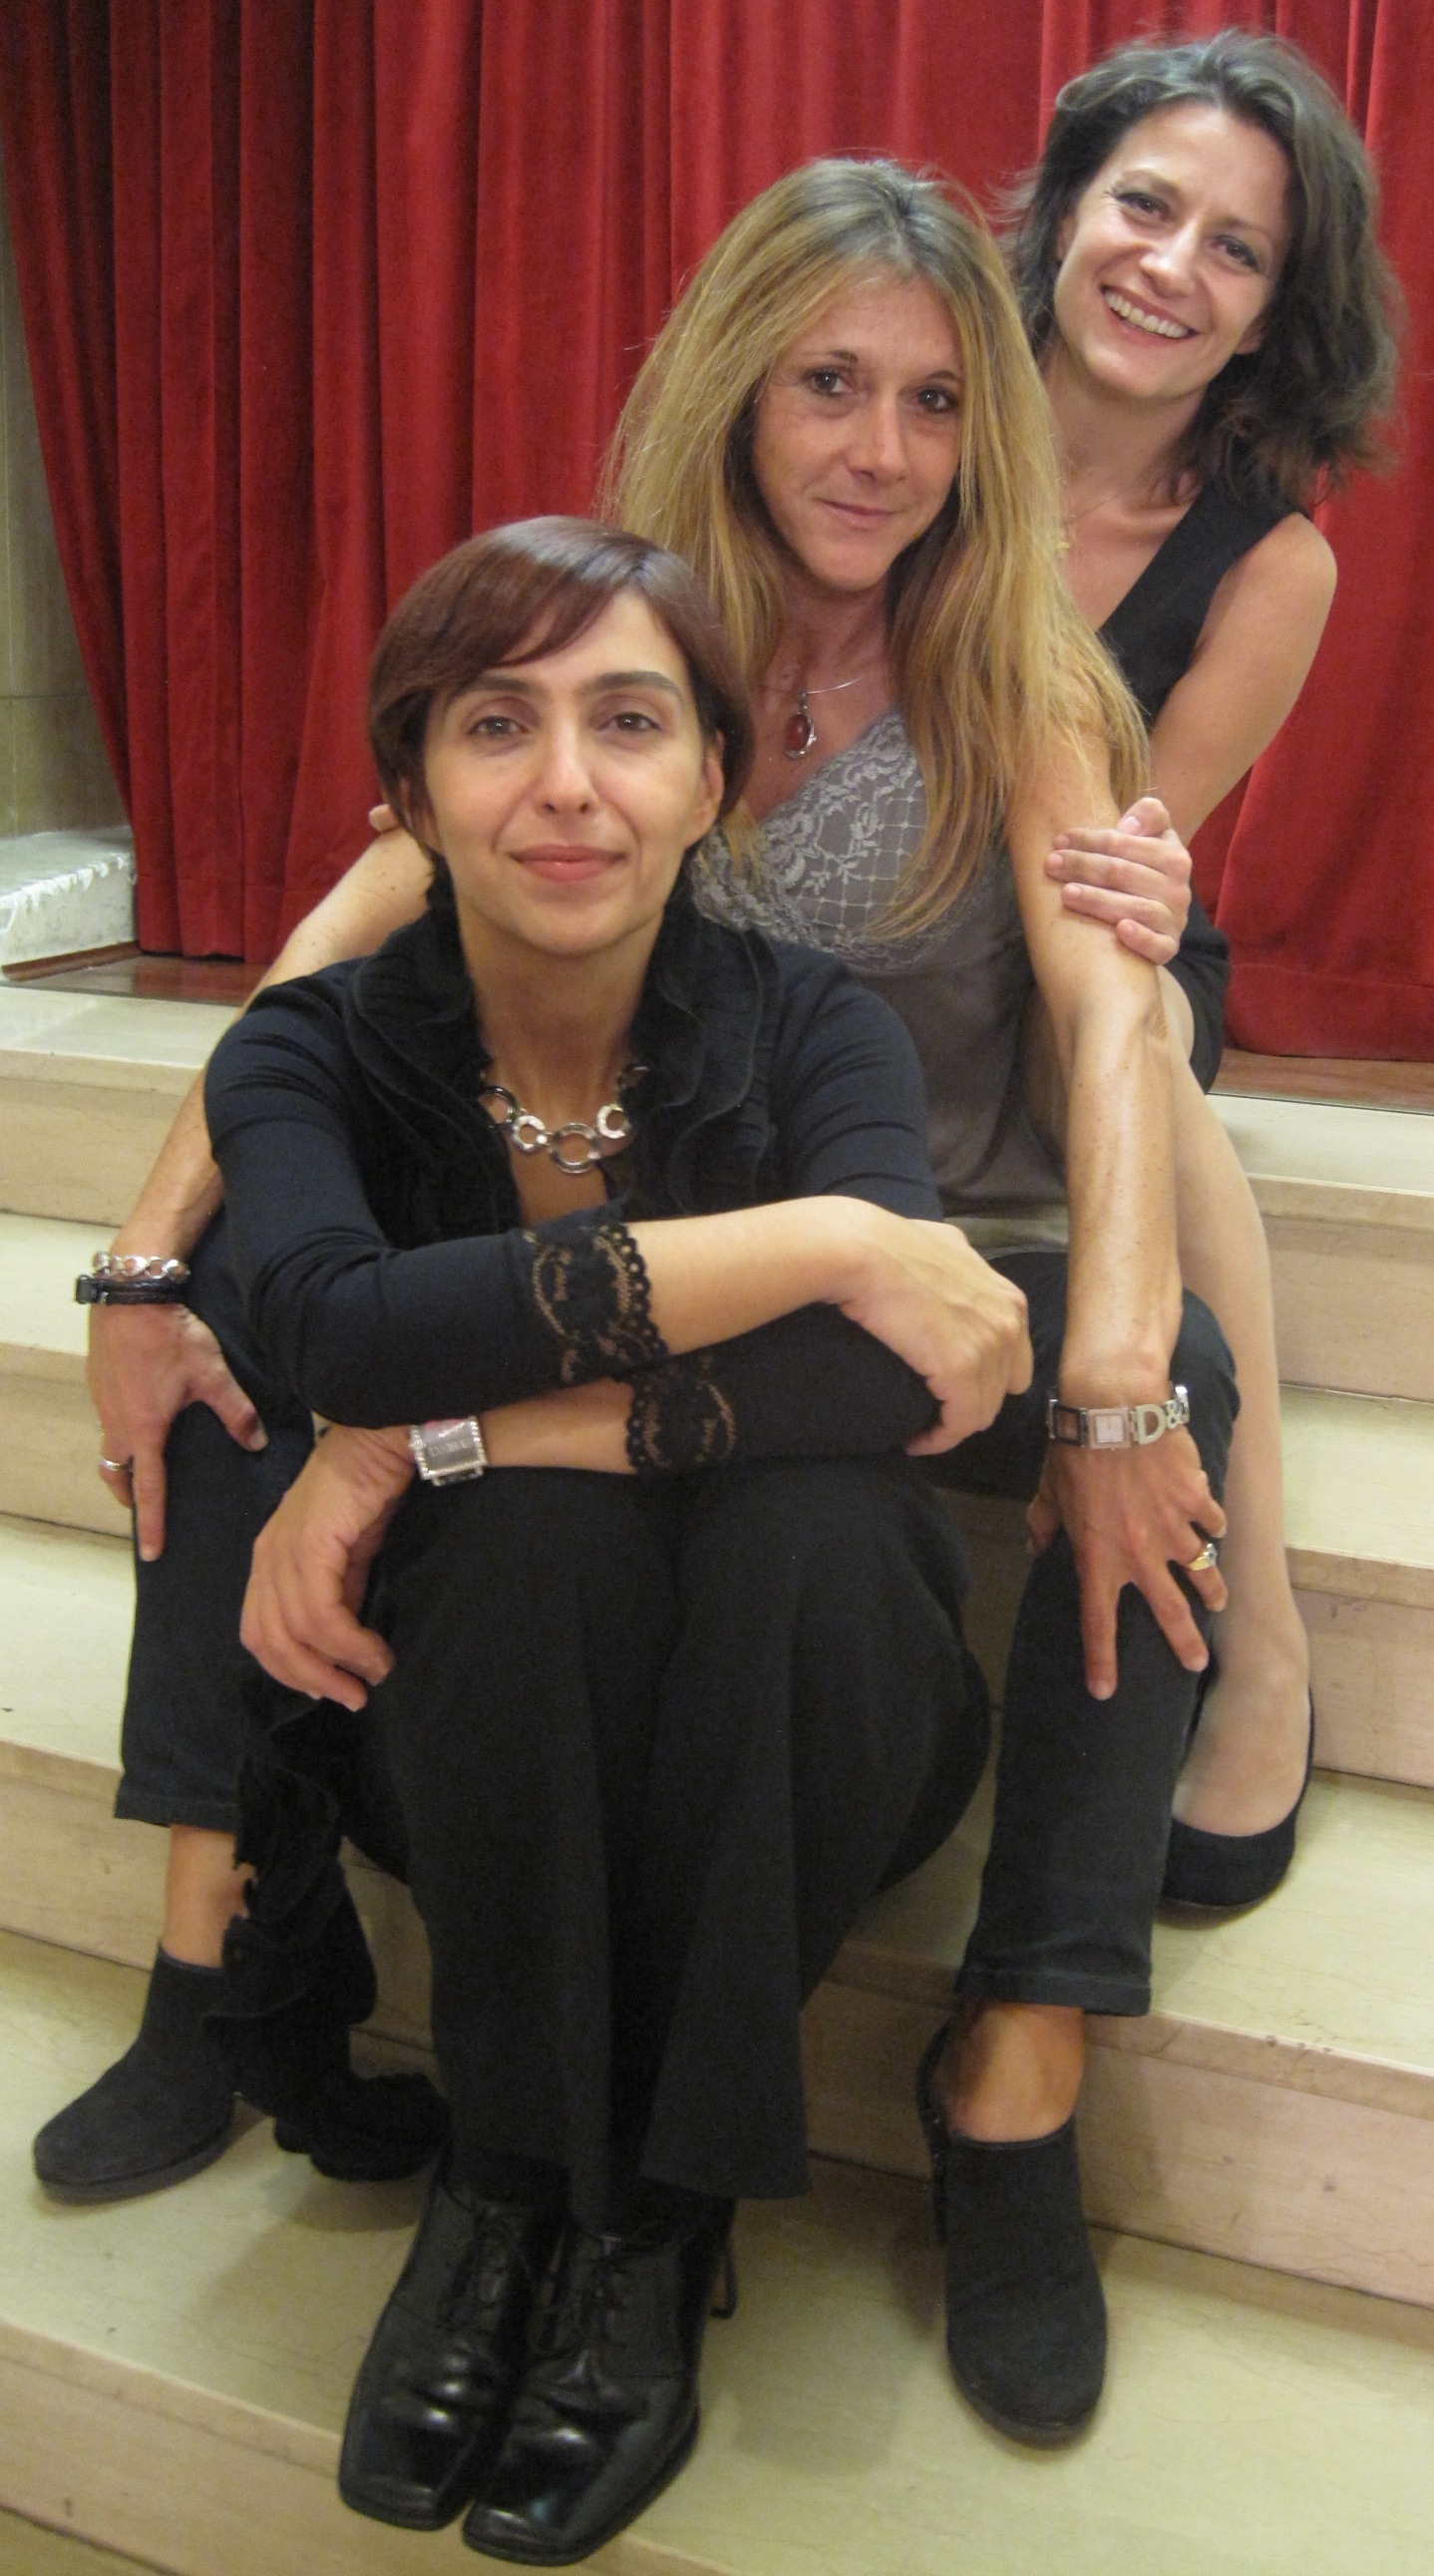 ©Carla Magnan, Roberta Vacca, Carla Rebora Firenze Play it! 2012